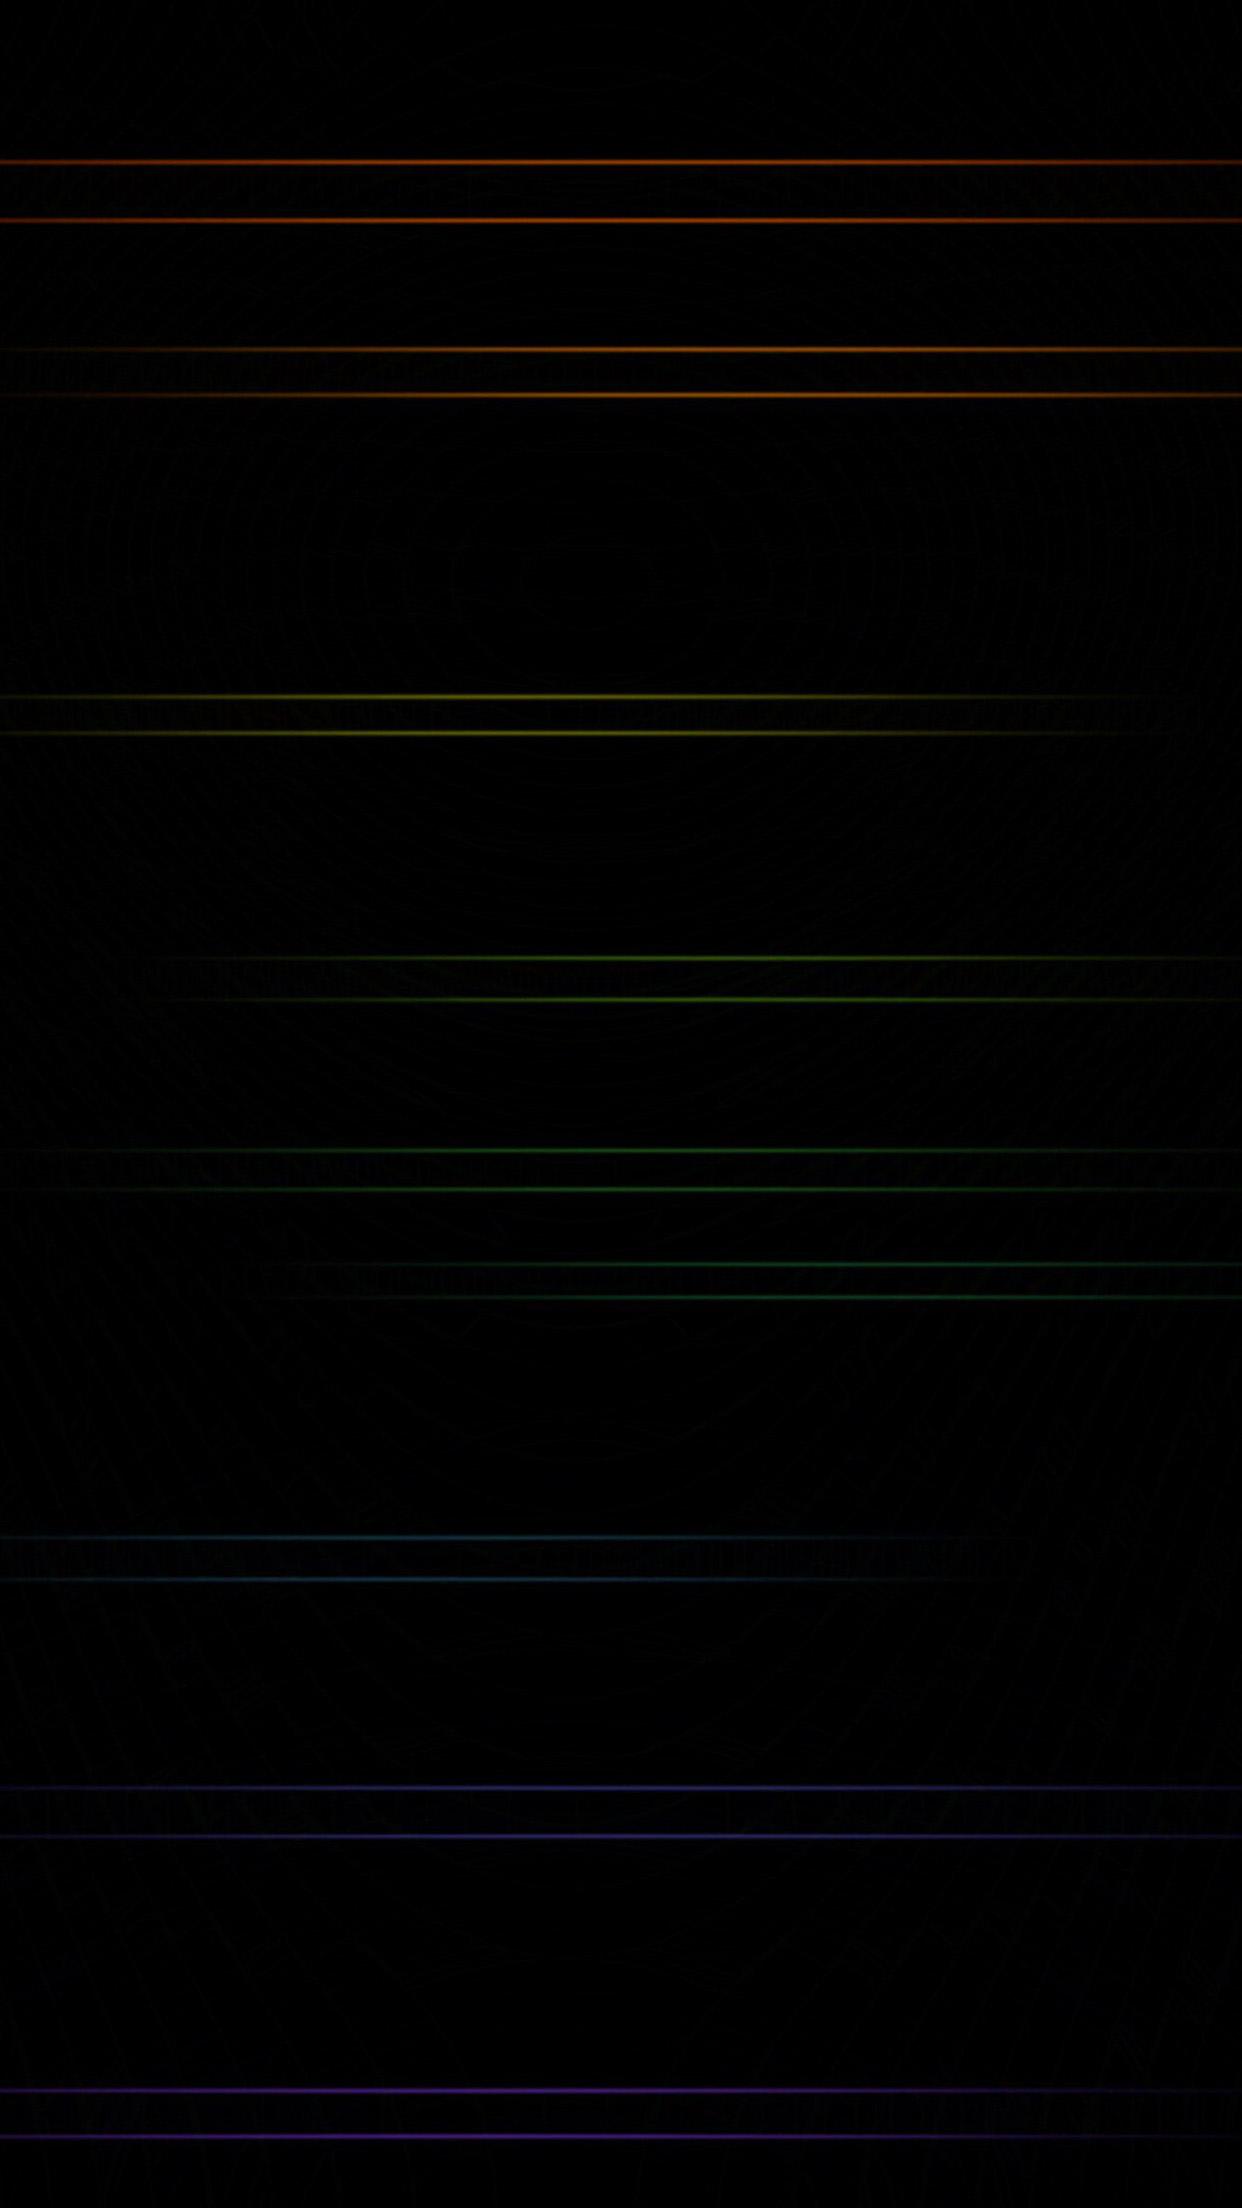 vu14 line dark color pattern wallpaper